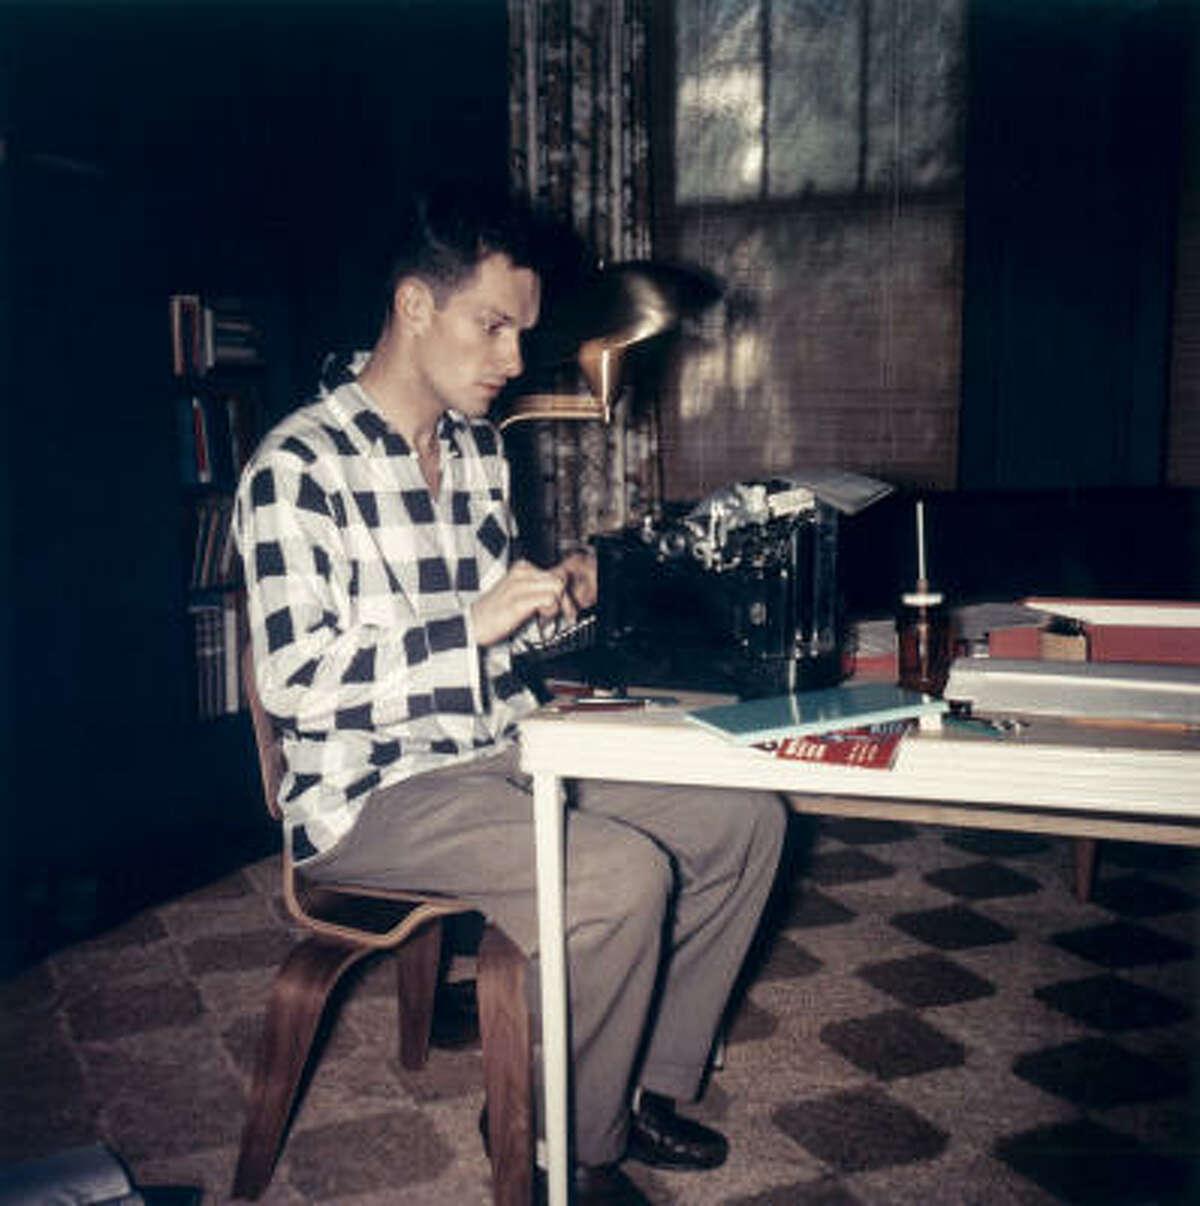 EARLY DAYS: Hugh Hefner created Playboy when he was 27.